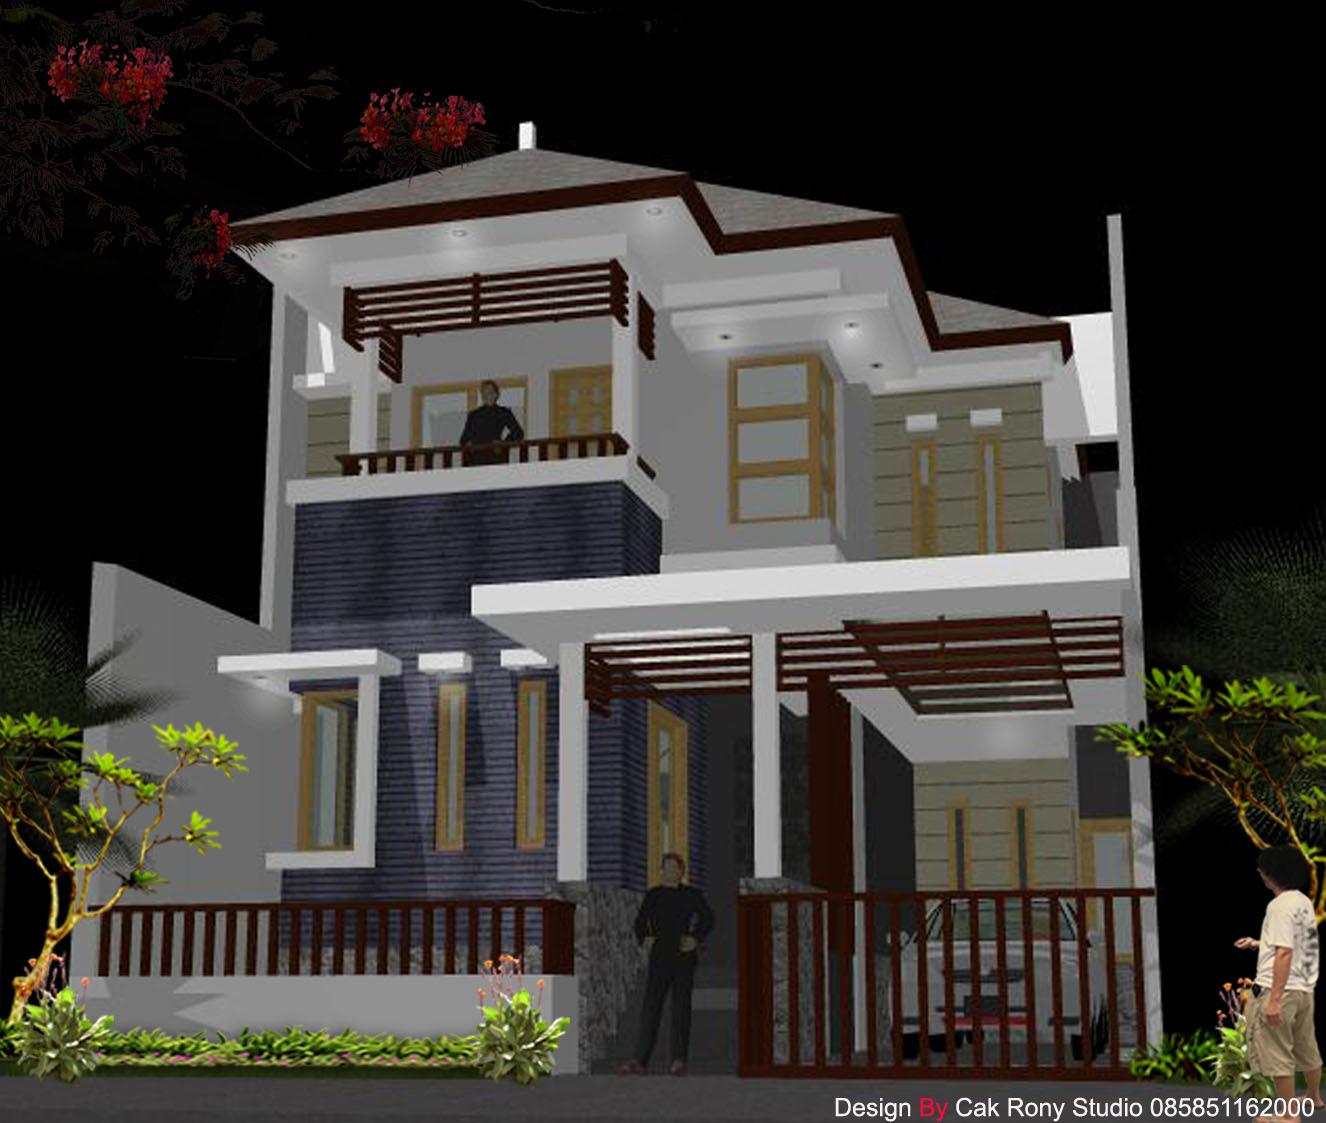 Desain Rumah Minimalislantai 6x15 Tambunbekasiindograha